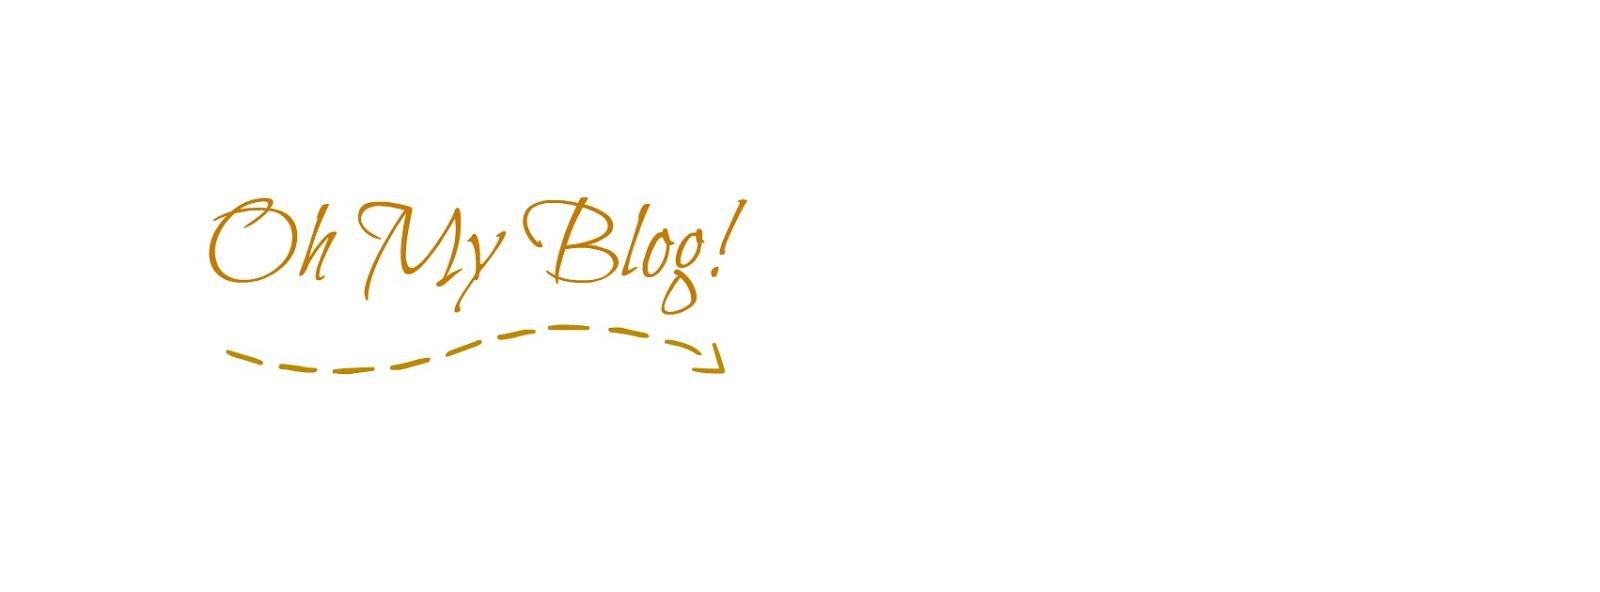 Oh My Blog!